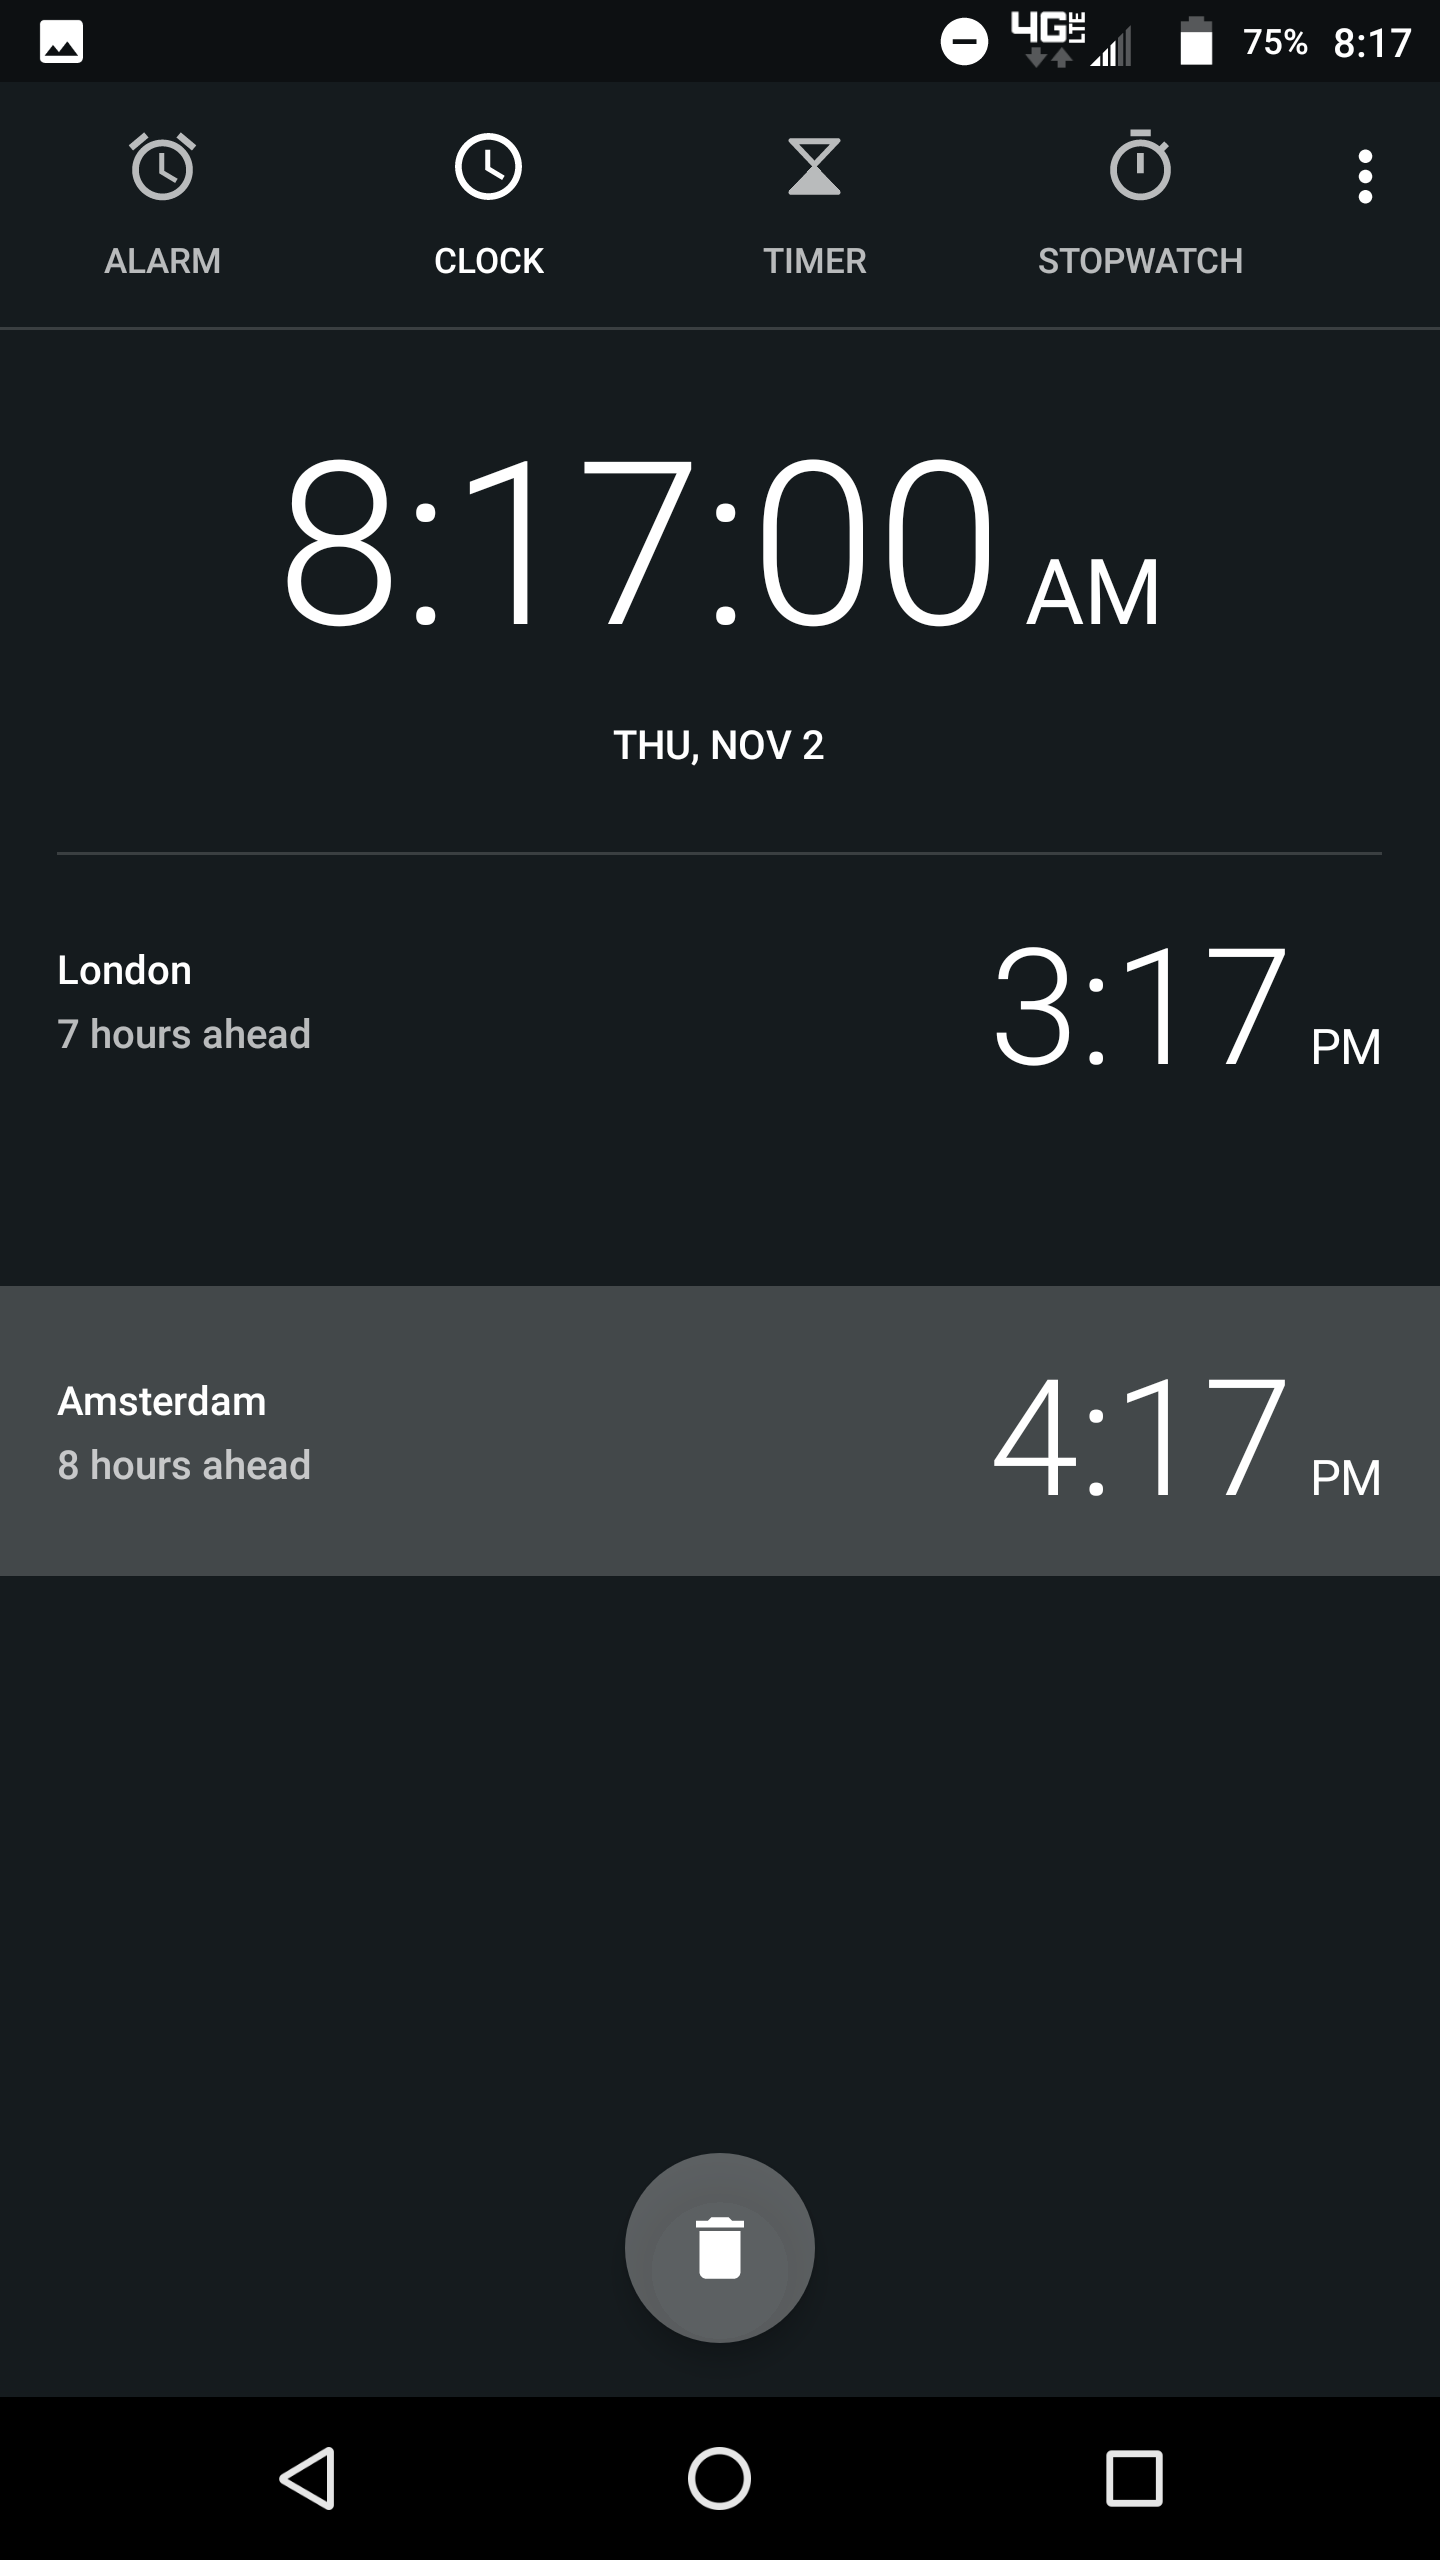 Google Clock 5 2 update adds new icon & tweaked world clocks list w